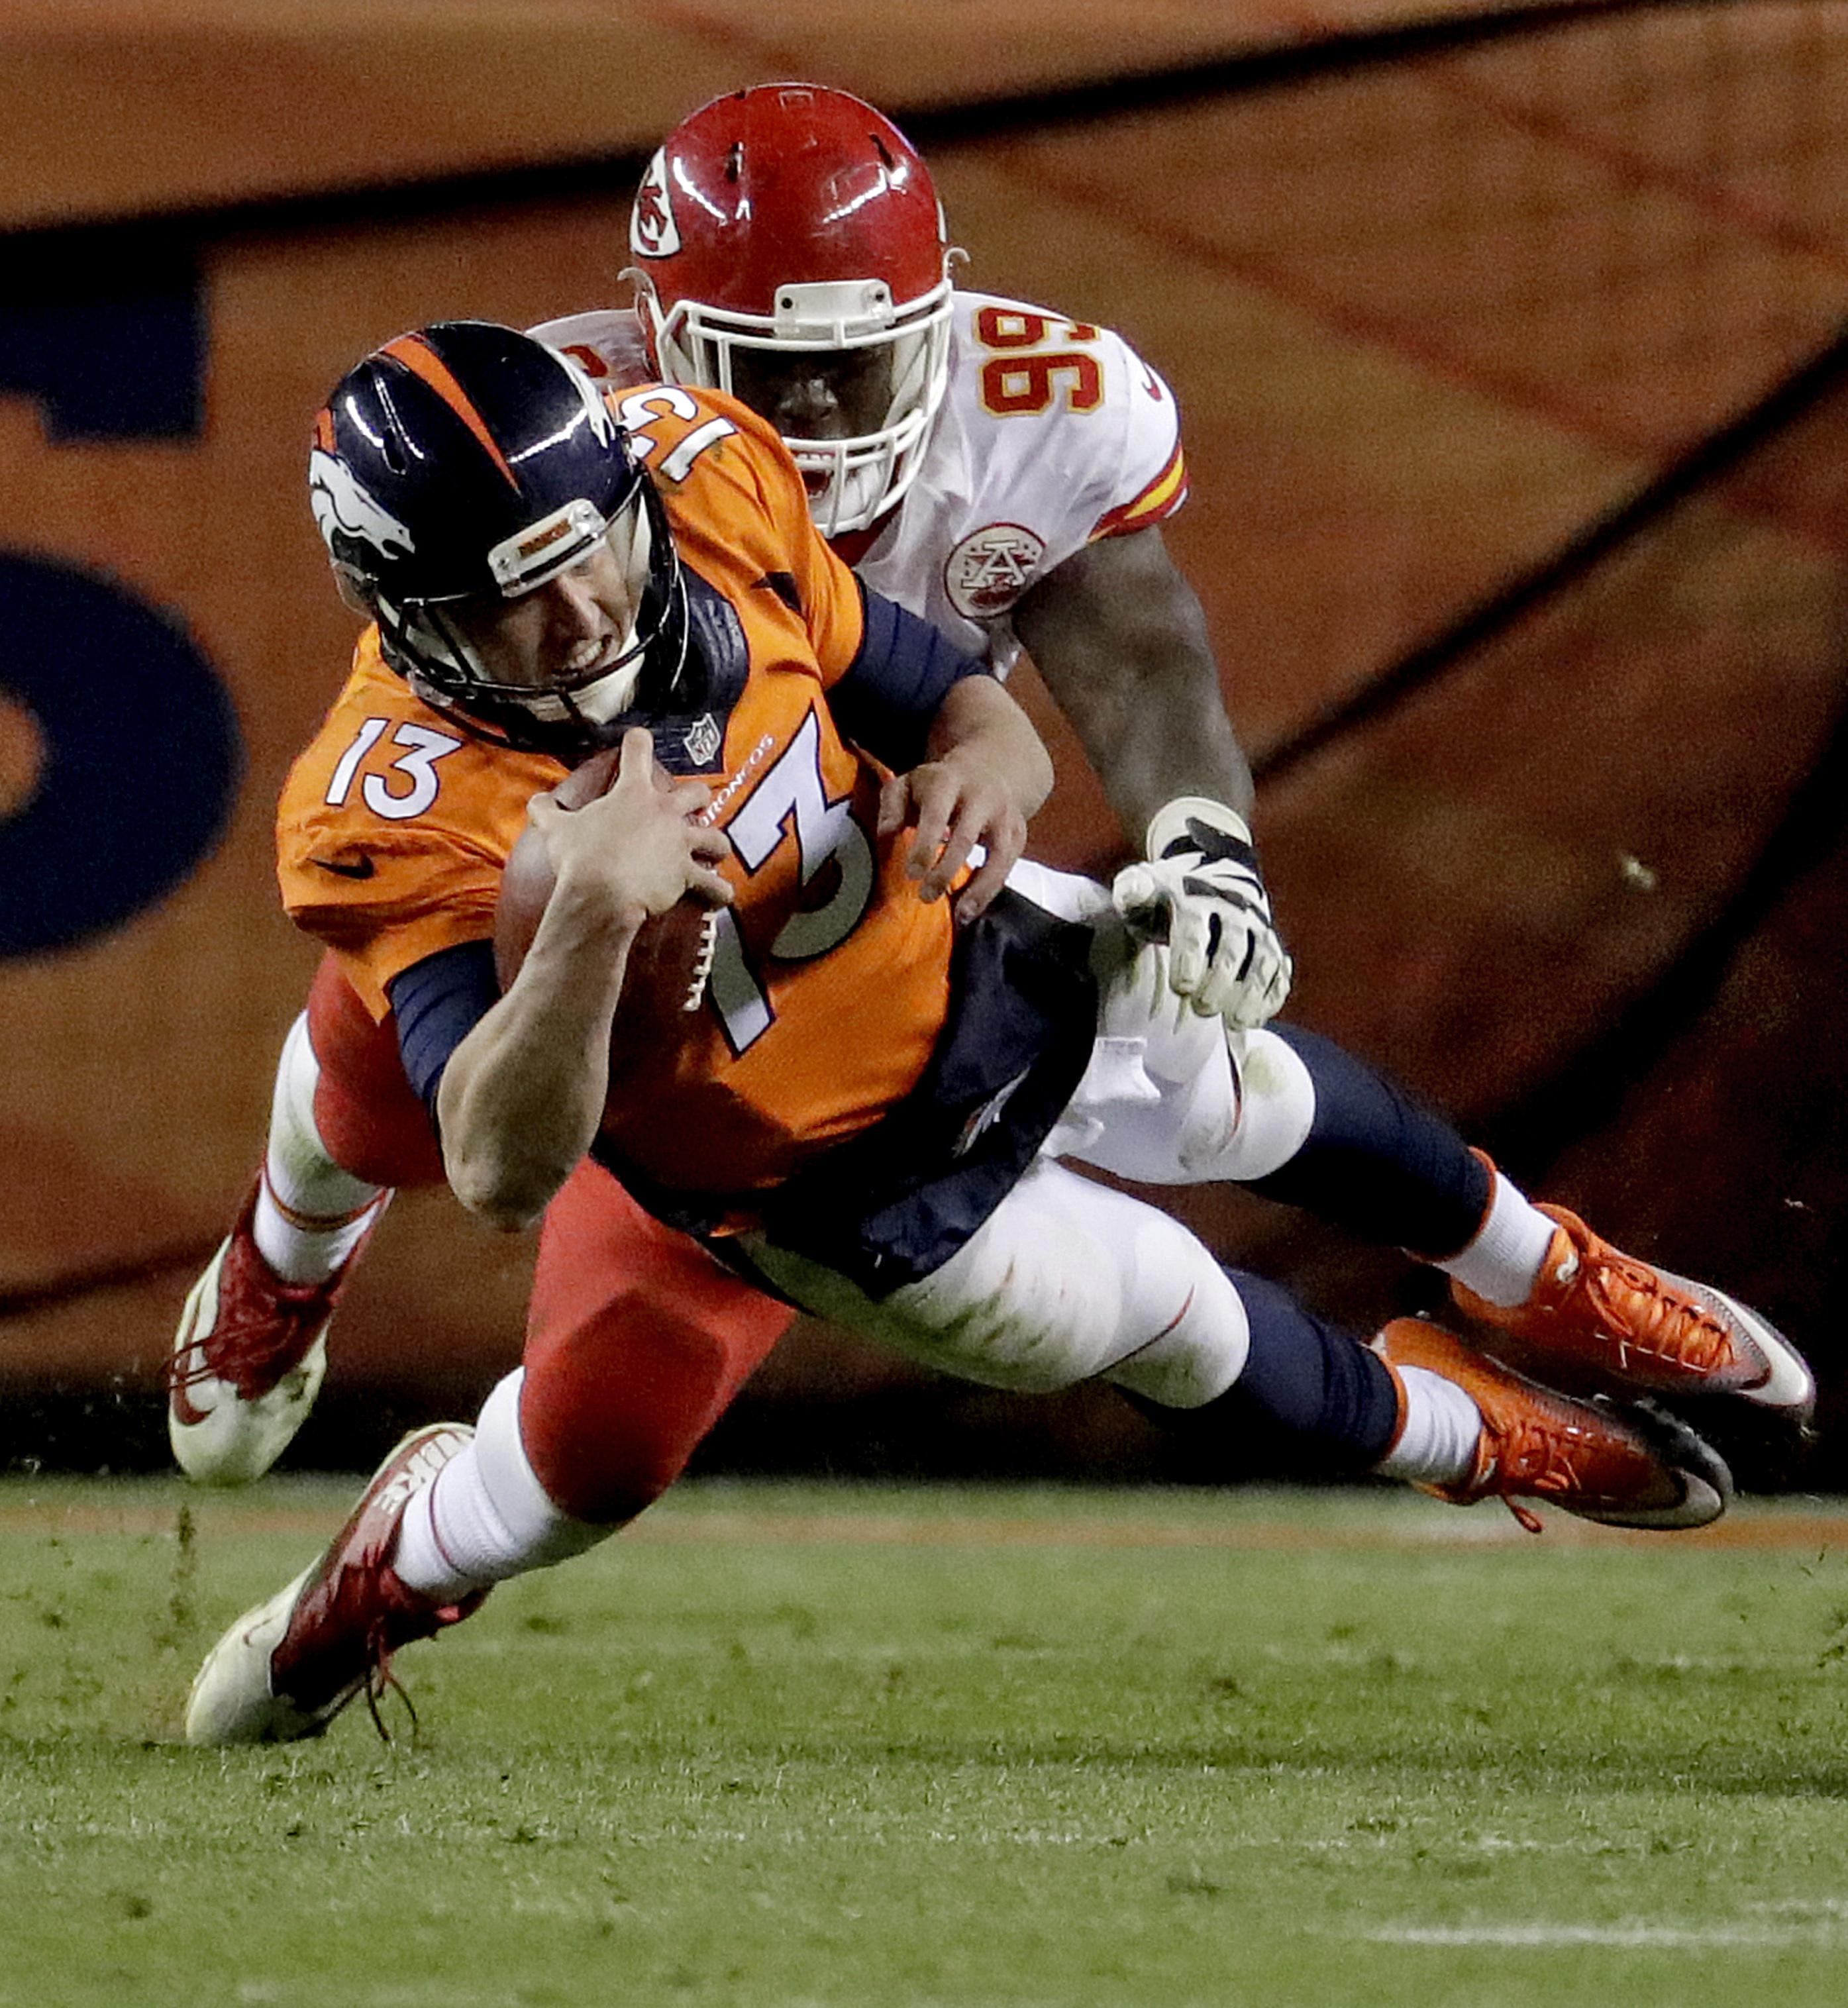 Denver Broncos quarterback Trevor Siemian (13) dives as Kansas City Chiefs defensive tackle Rakeem Nunez-Roches (99) pursues during the second half of an NFL football game, Sunday, Nov. 27, 2016, in Denver. (AP Photo/Jack Dempsey)